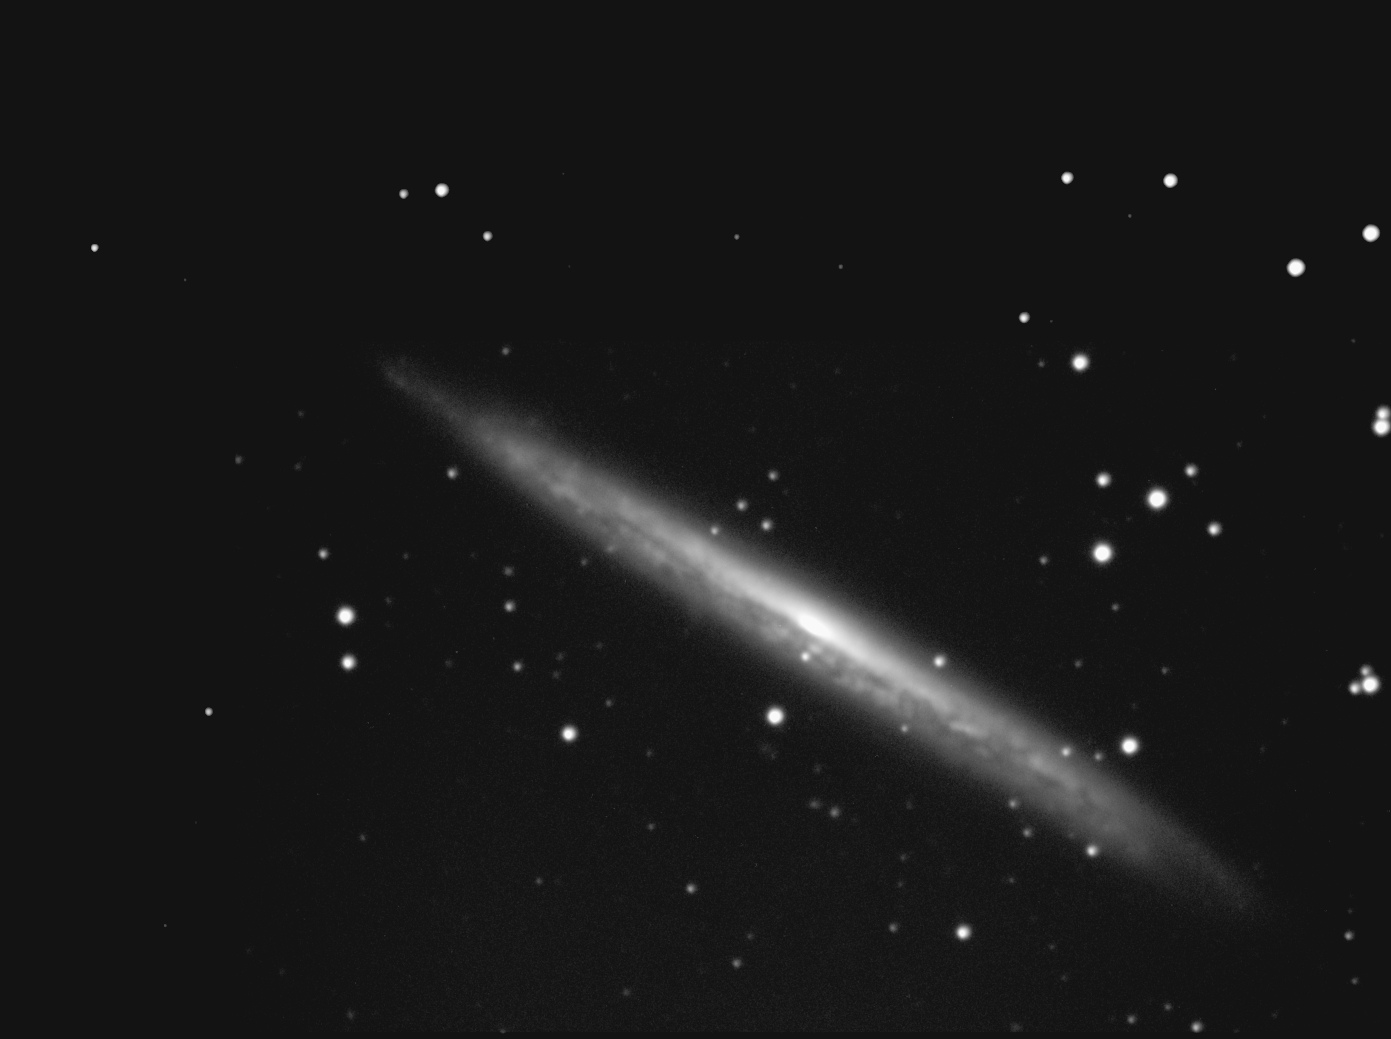 5c9b6fbe6c33f_NGC5907.20190326_170.jpg.960bbf7858811a3724ecca306e43eb5e.jpg